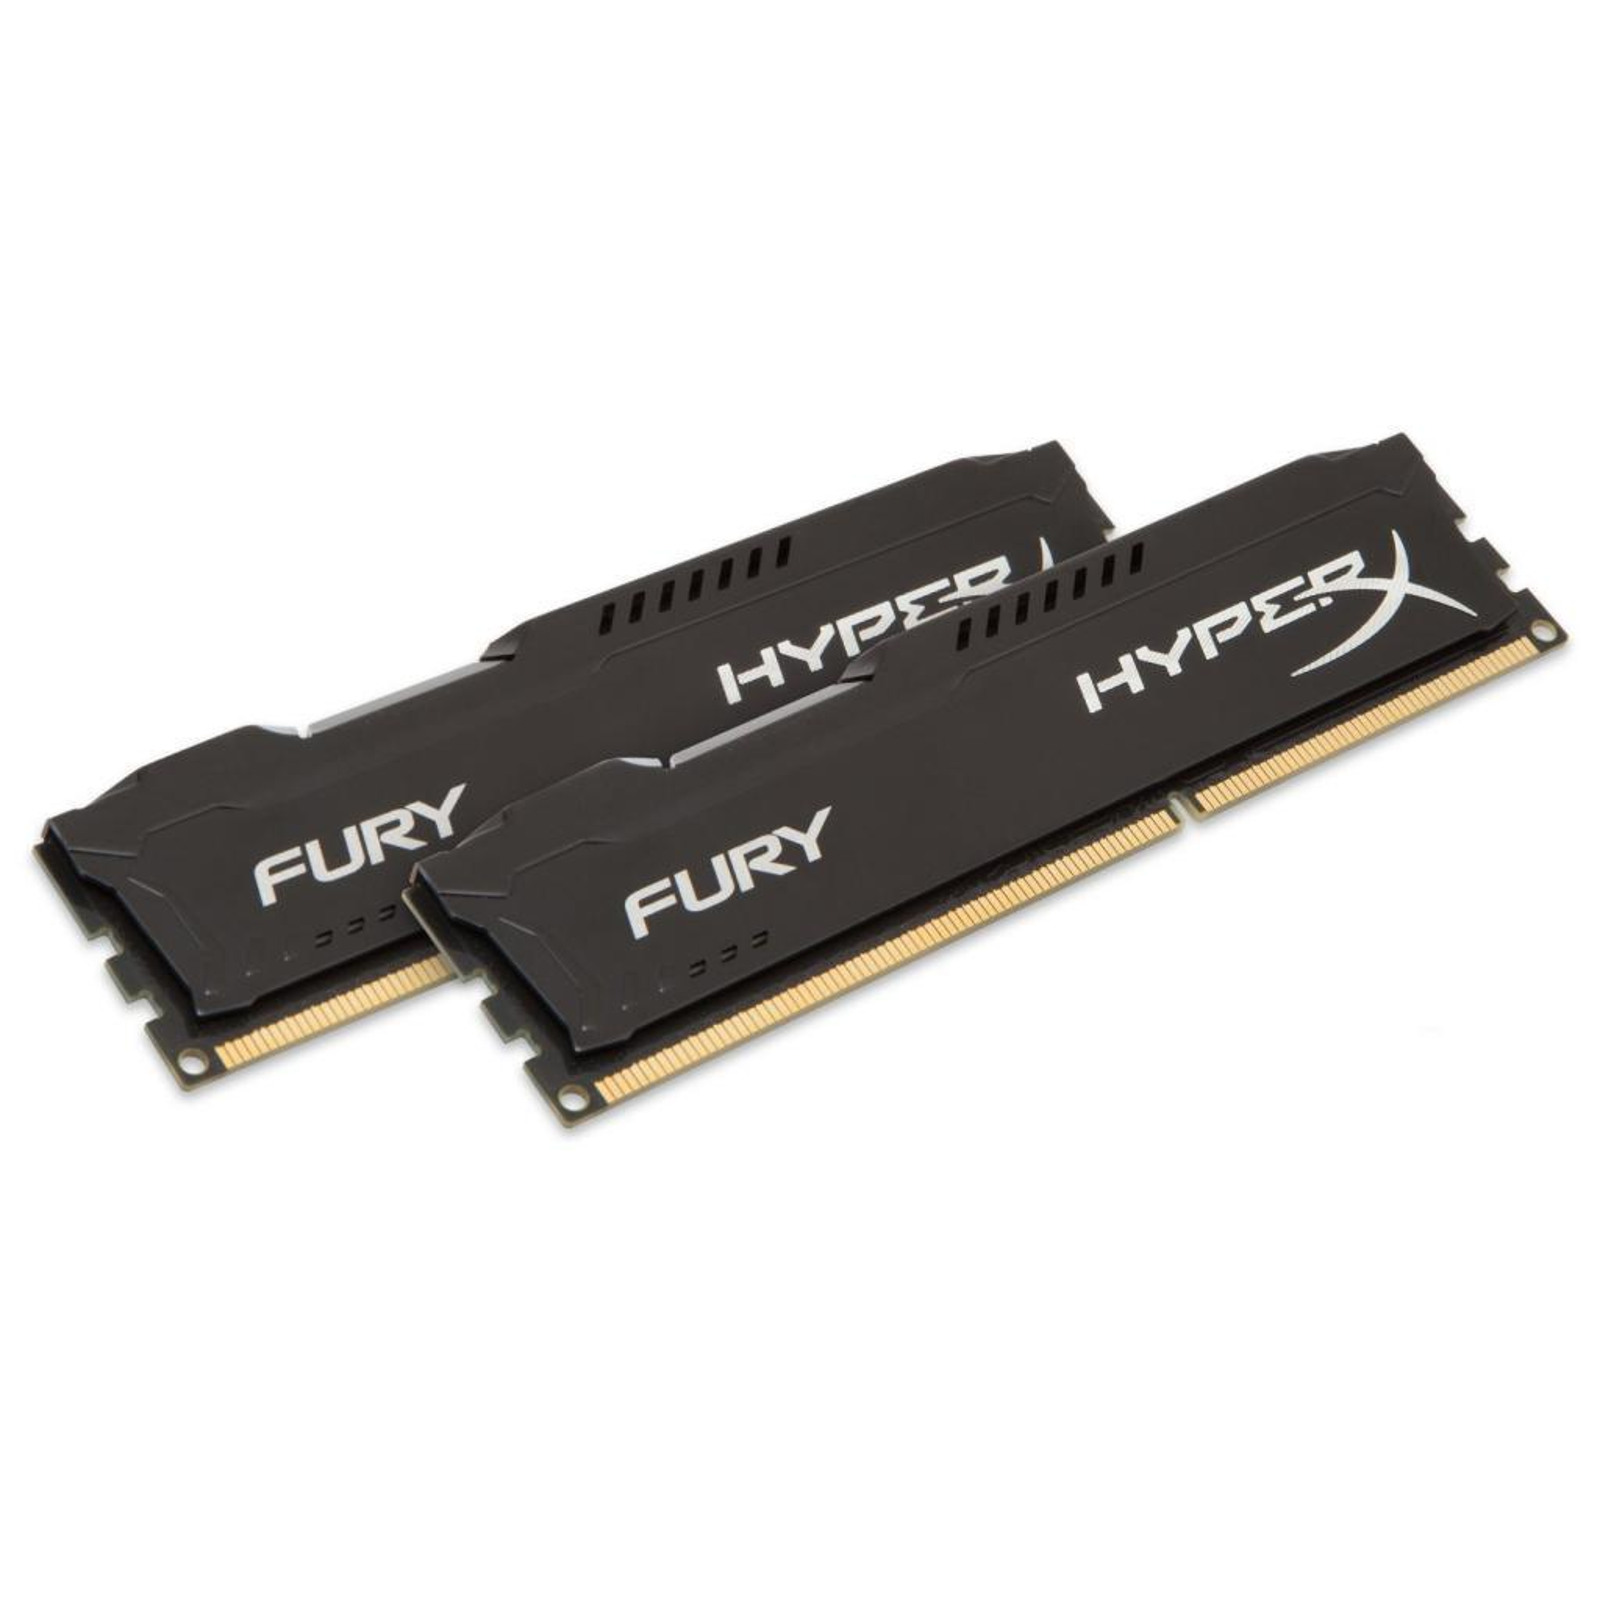 Модуль памяти для компьютера DDR4 32GB (2x16GB) 3200 MHz HyperX FURY Black HyperX (Kingston Fury) (HX432C18FBK2/32) изображение 2